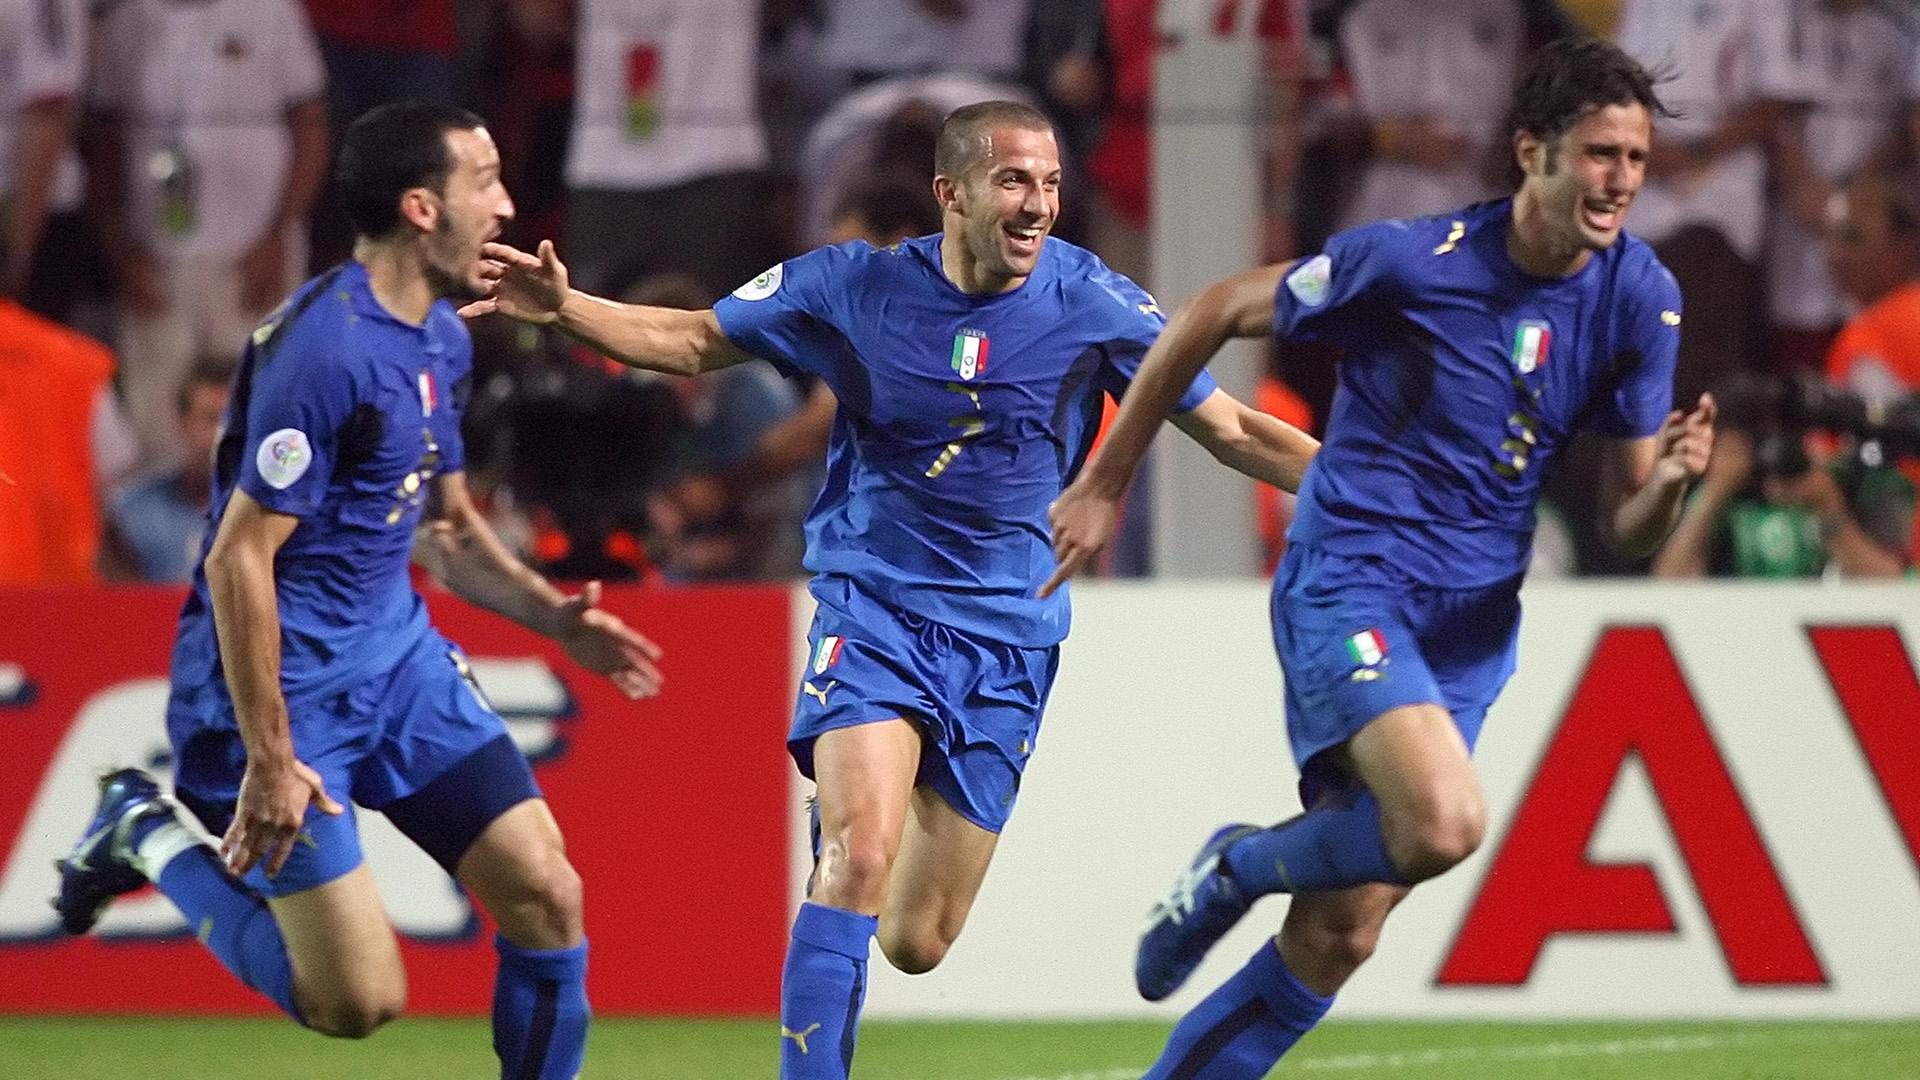 Fabio Grosso Italy Germany 2006 World Cup